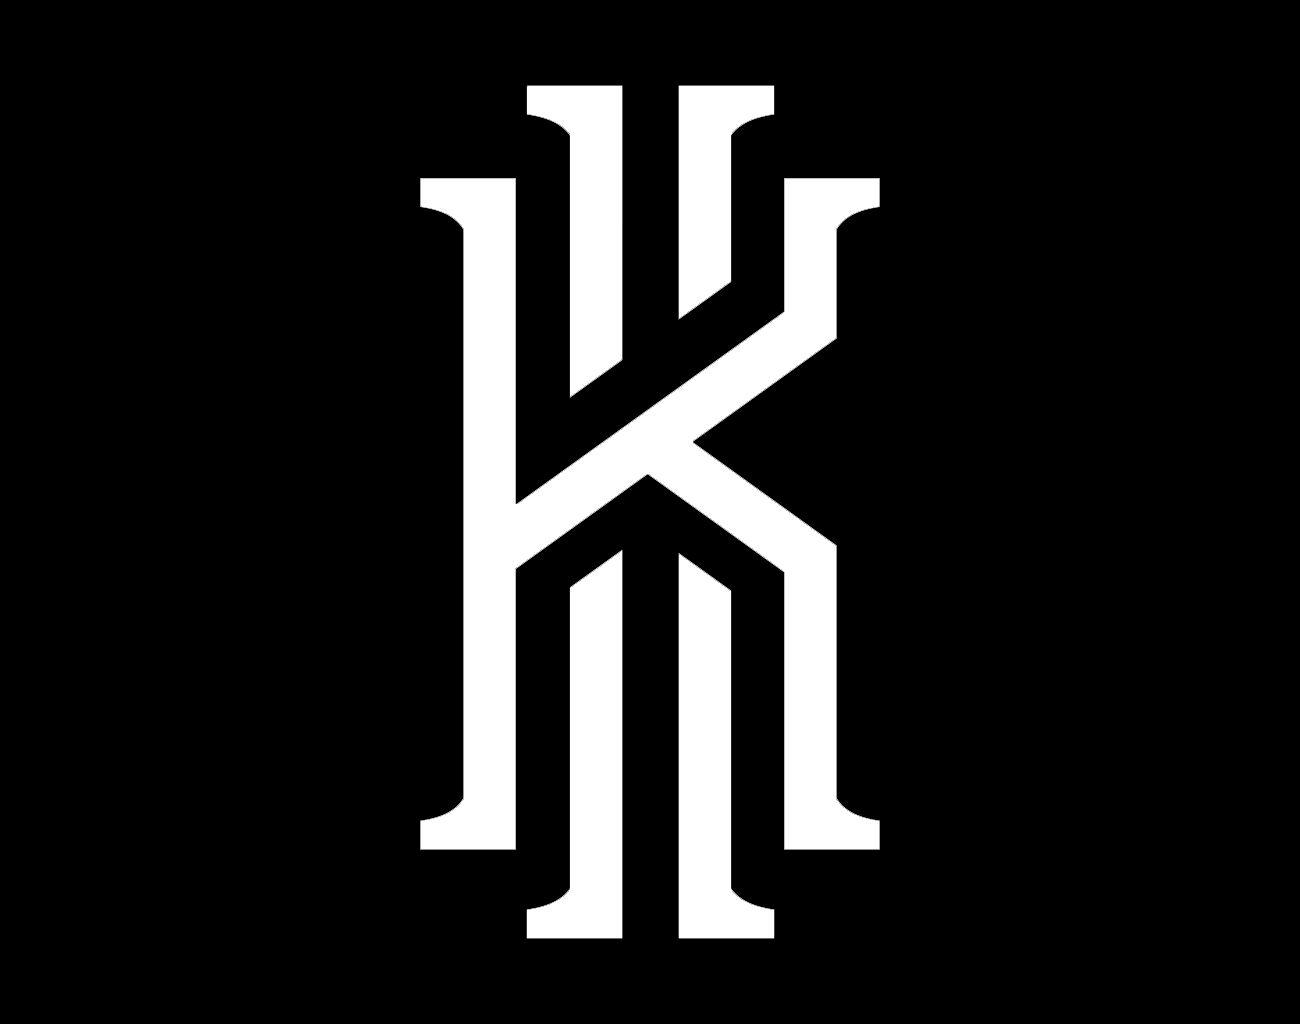 Symbol Kyrie Irving Kyrie Irving Logo Wallpaper Kyrie Irving Logo Kyrie Irving